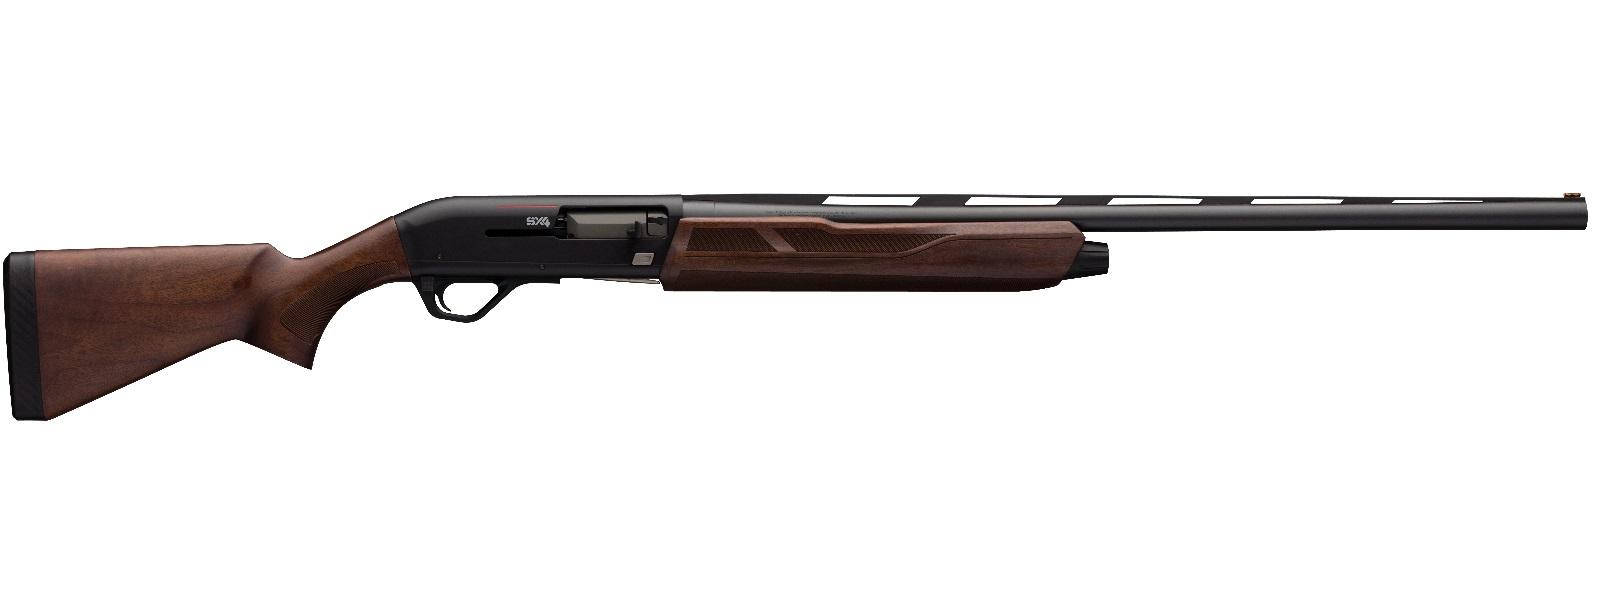 Winchester SX4 Field Compact 12 Gauge